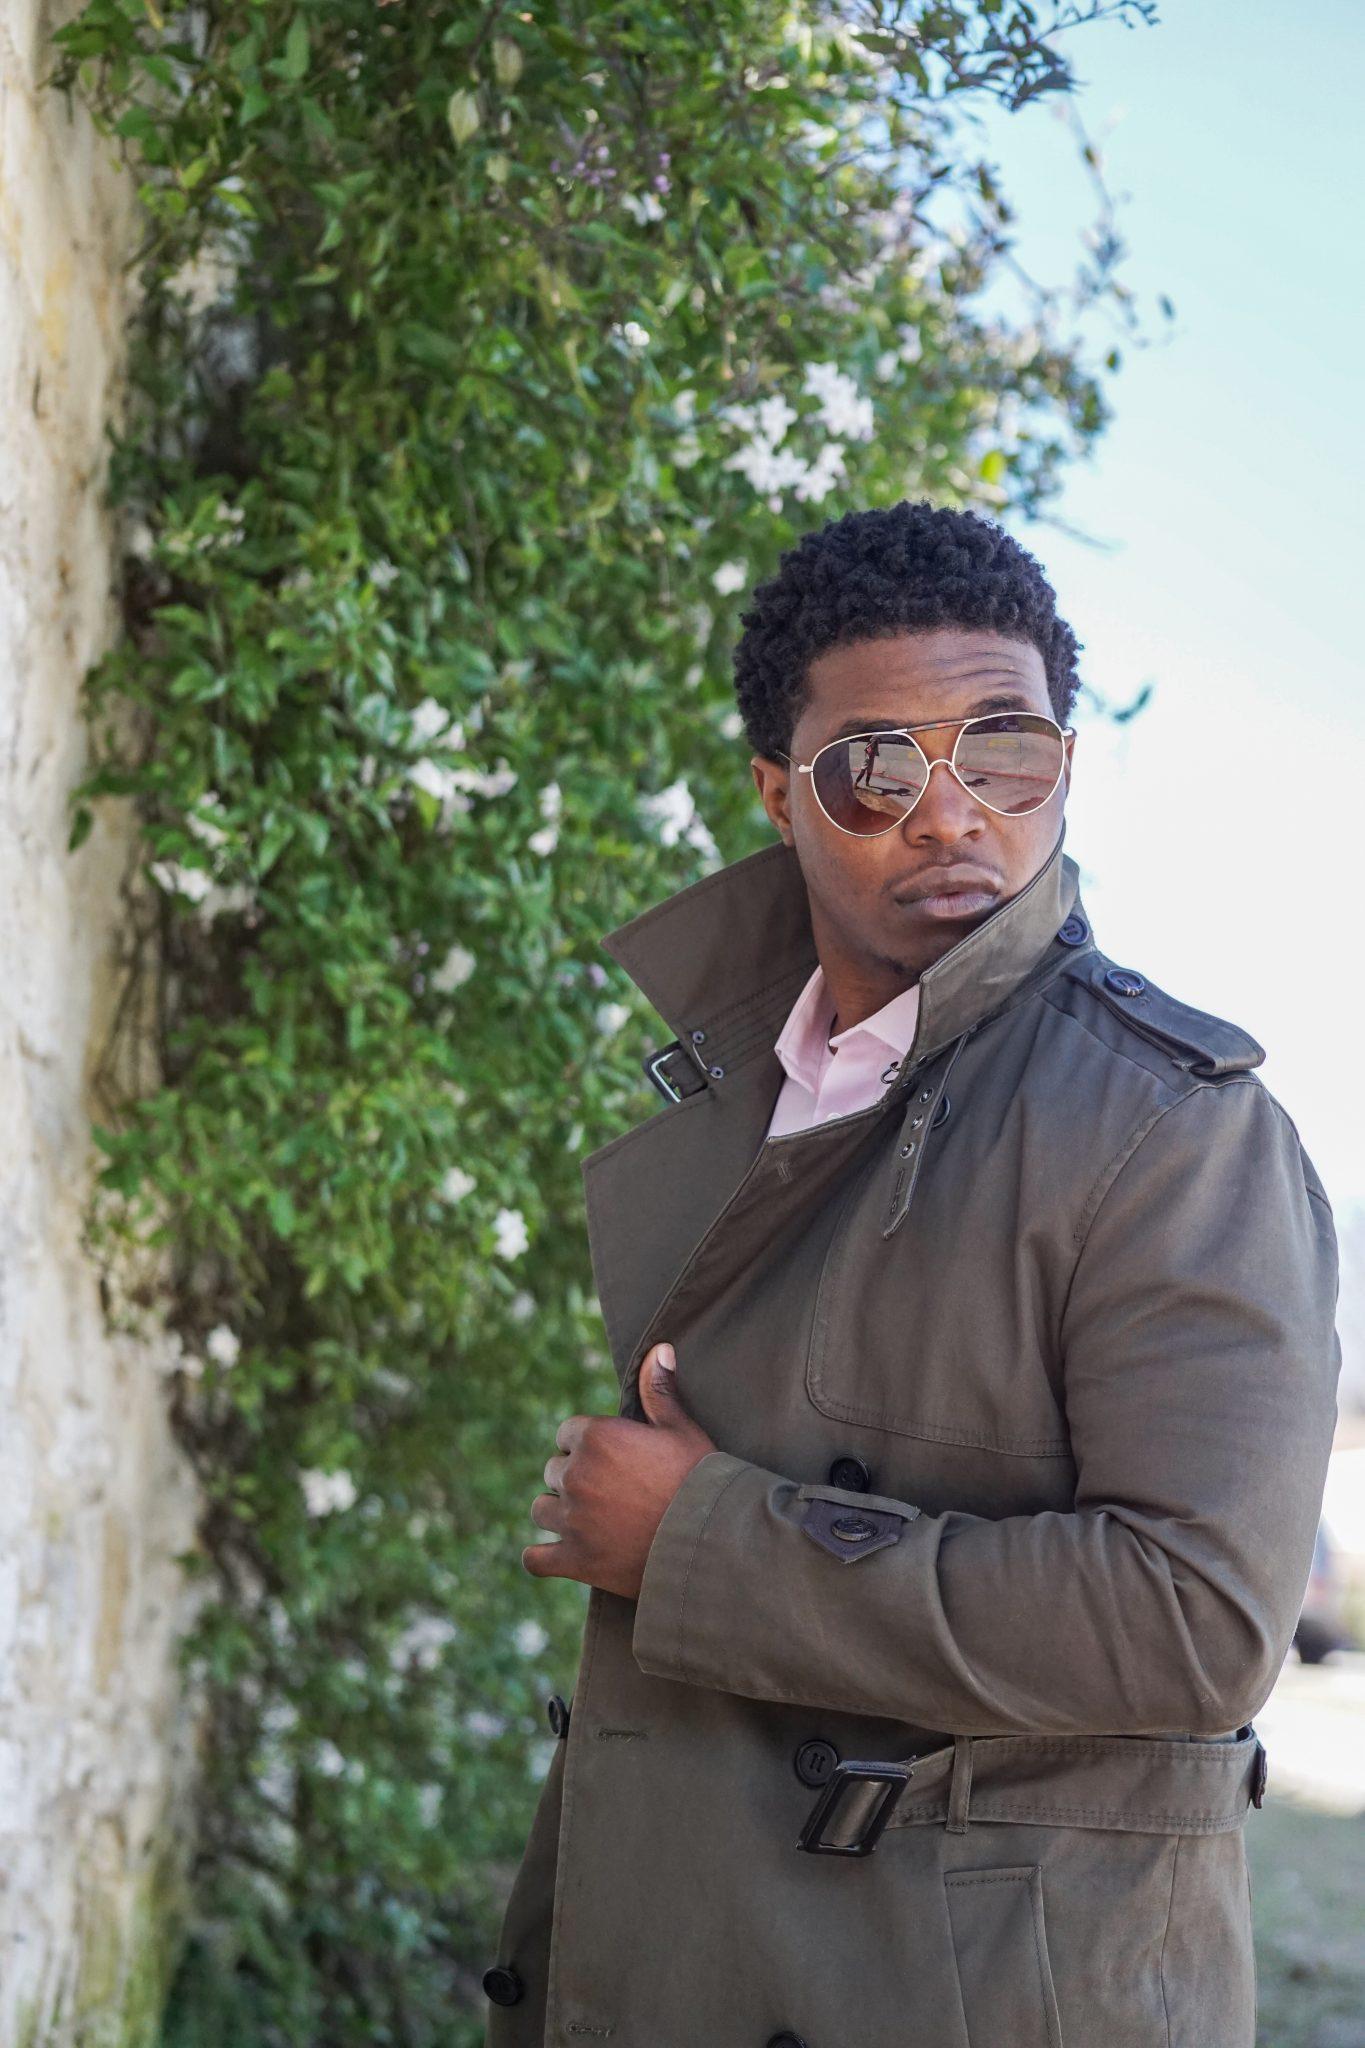 dapper-advisor-black-man-wearing-olive-trench coat-pink-shirt-aviator-glasses